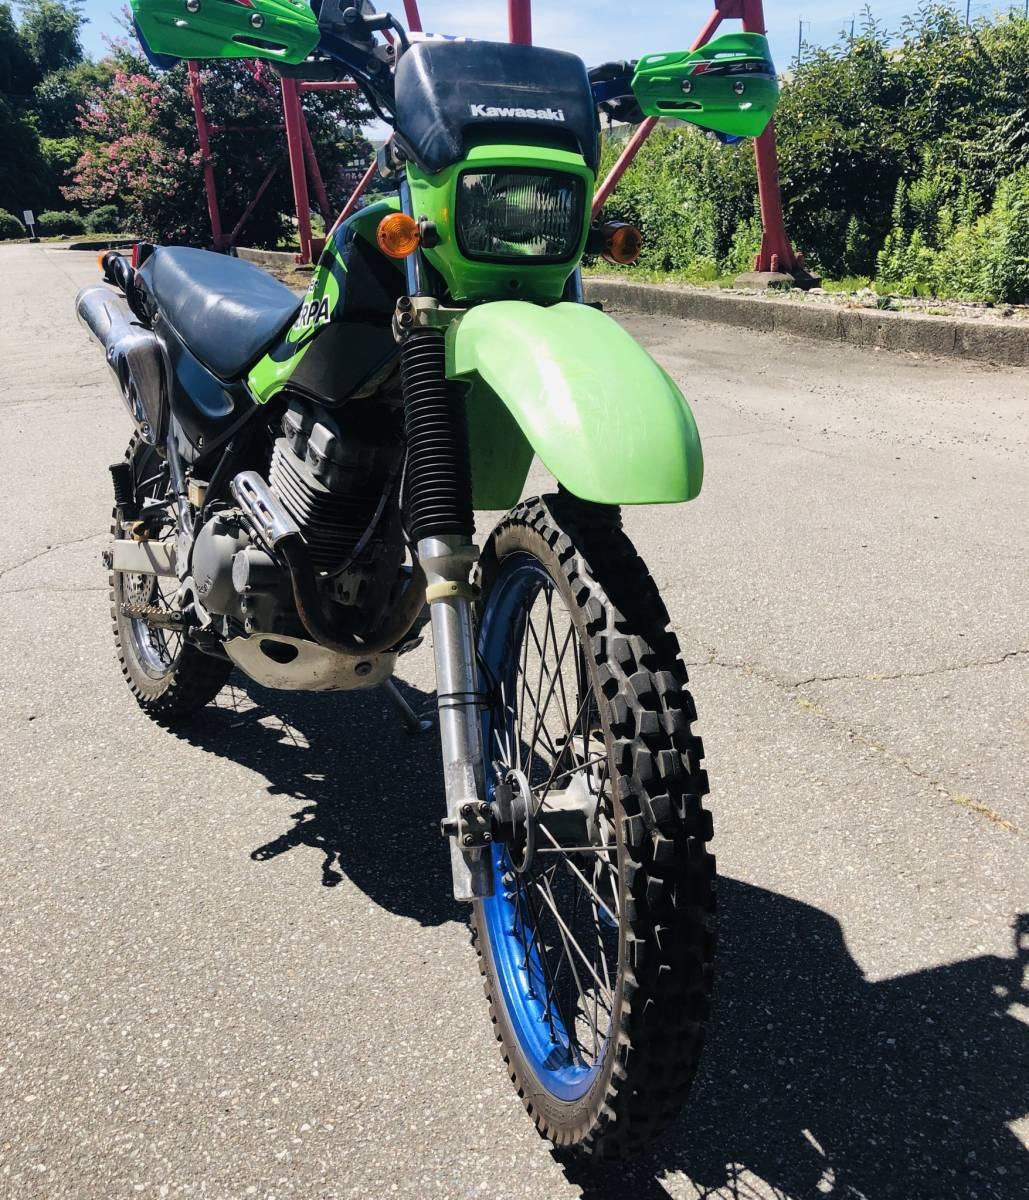 Тест-драйв мотоцикла Kawasaki KL250 Super Sherpa